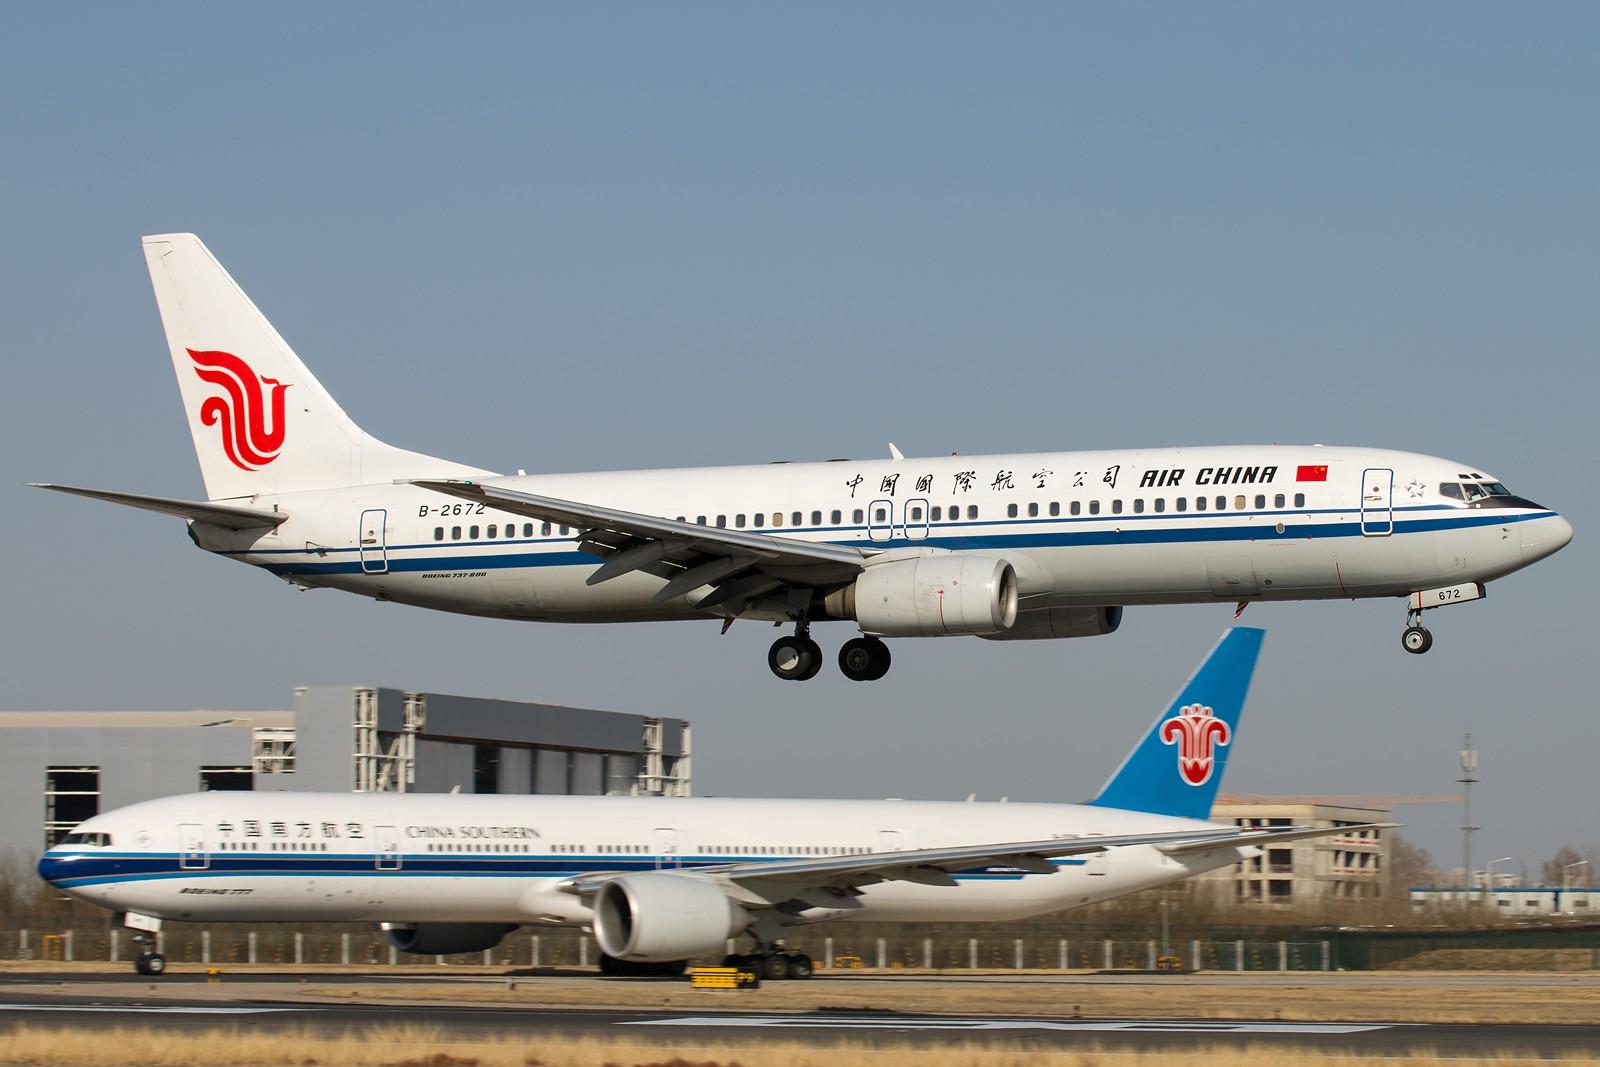 Re:[原创]常规货一组[10pics] BOEING 737-800 B-2672 中国北京首都国际机场